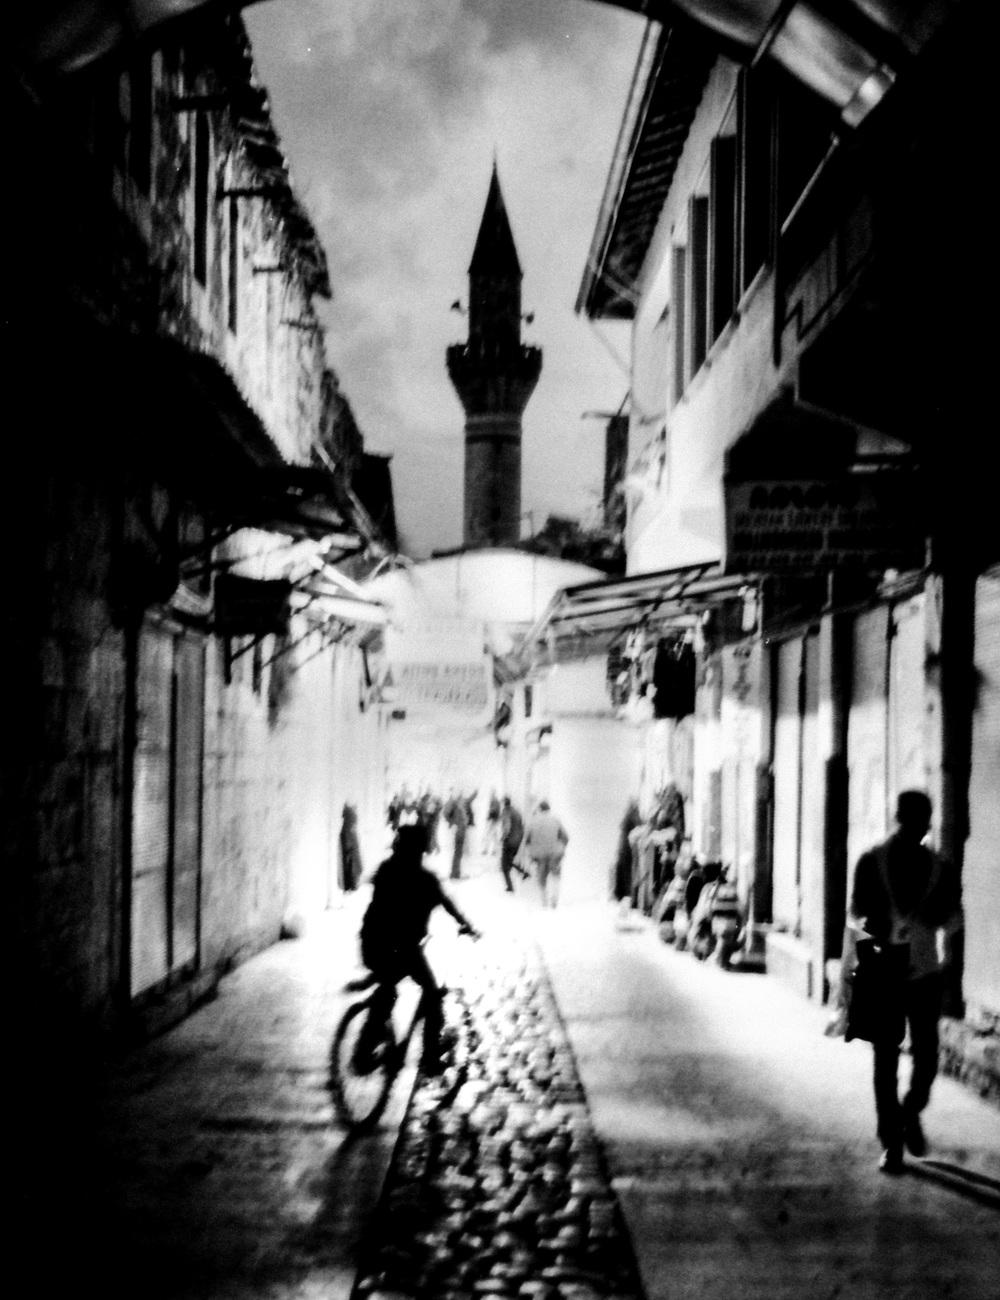 Old city, HATAY